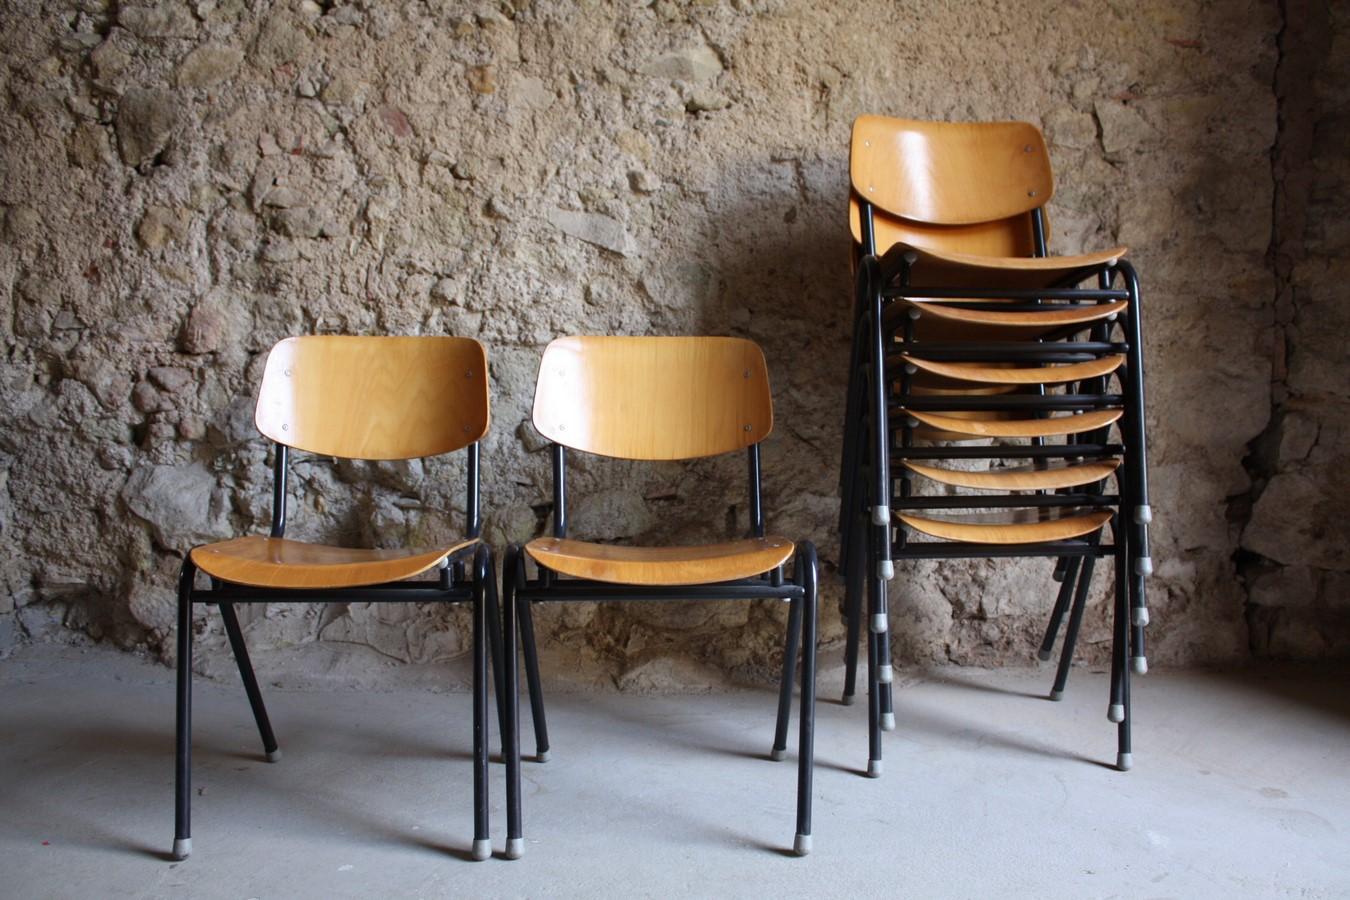 Schulst hle kantinenst hle werkstattst hle 1 v 30 for Stuhl industrial design